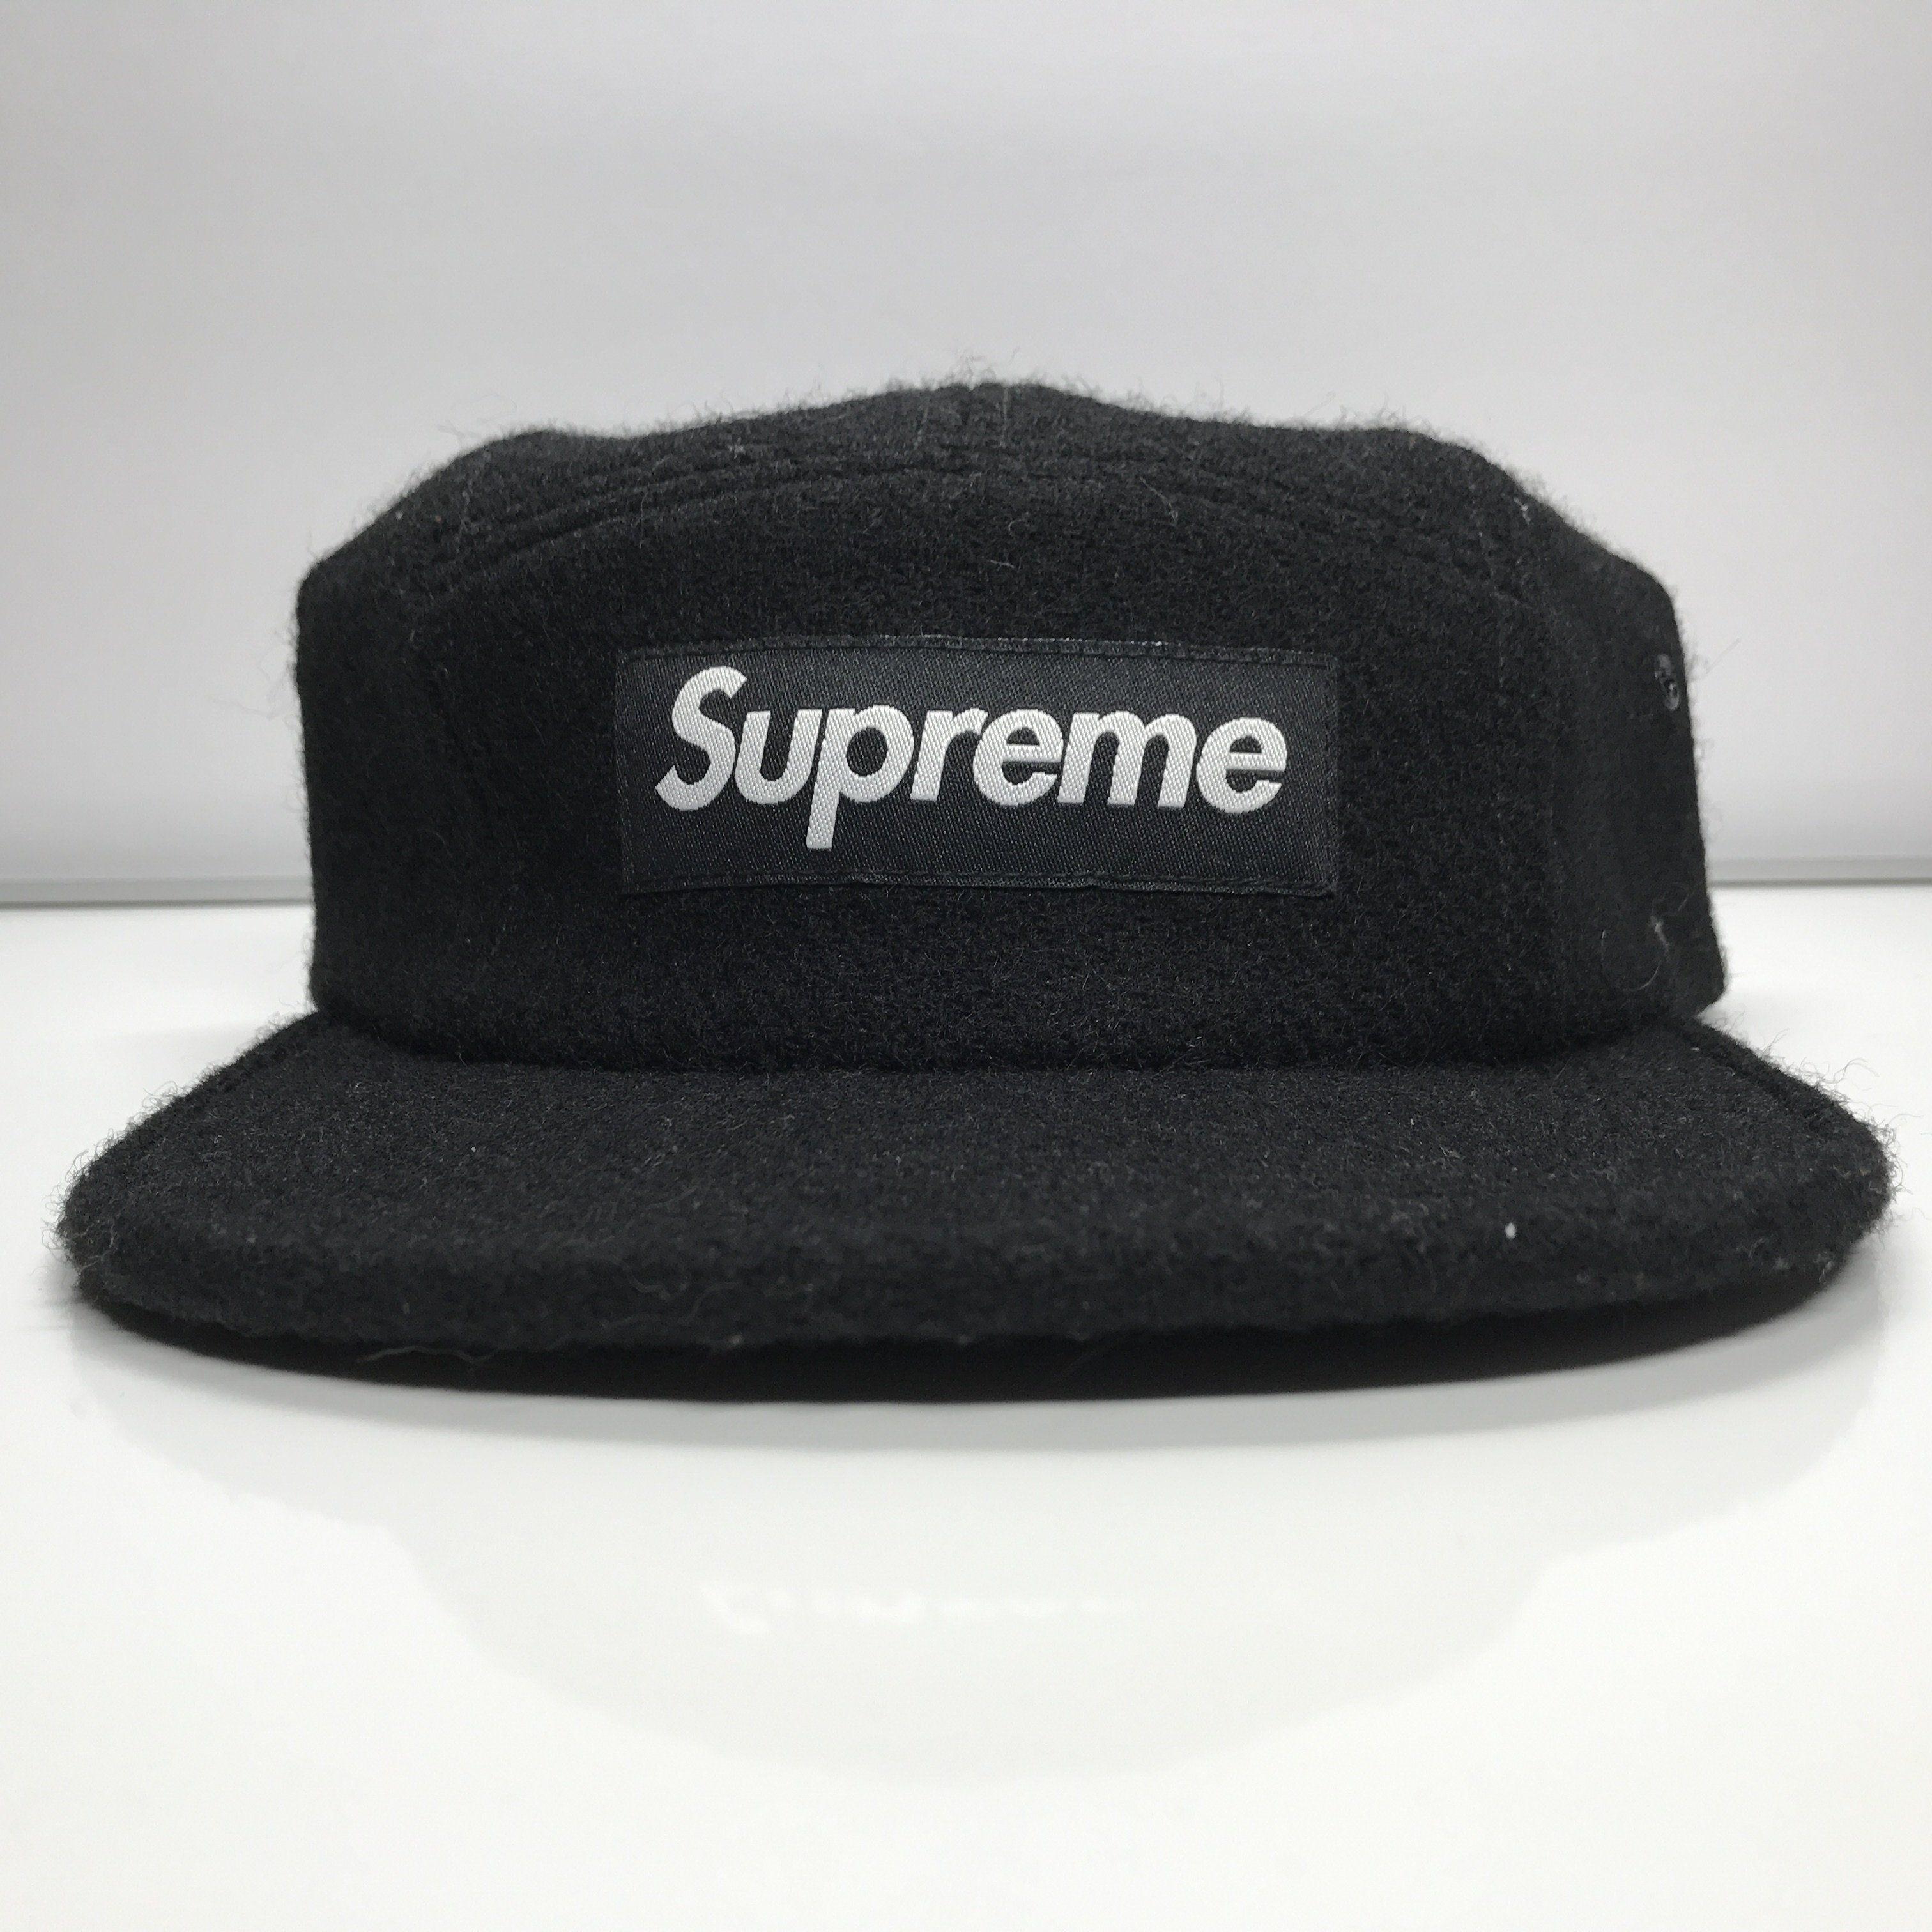 Supreme Harris Tweed Featherweight Wool Camp Cap Box Logo Black Hat FW16 8f2b4b0bc8b